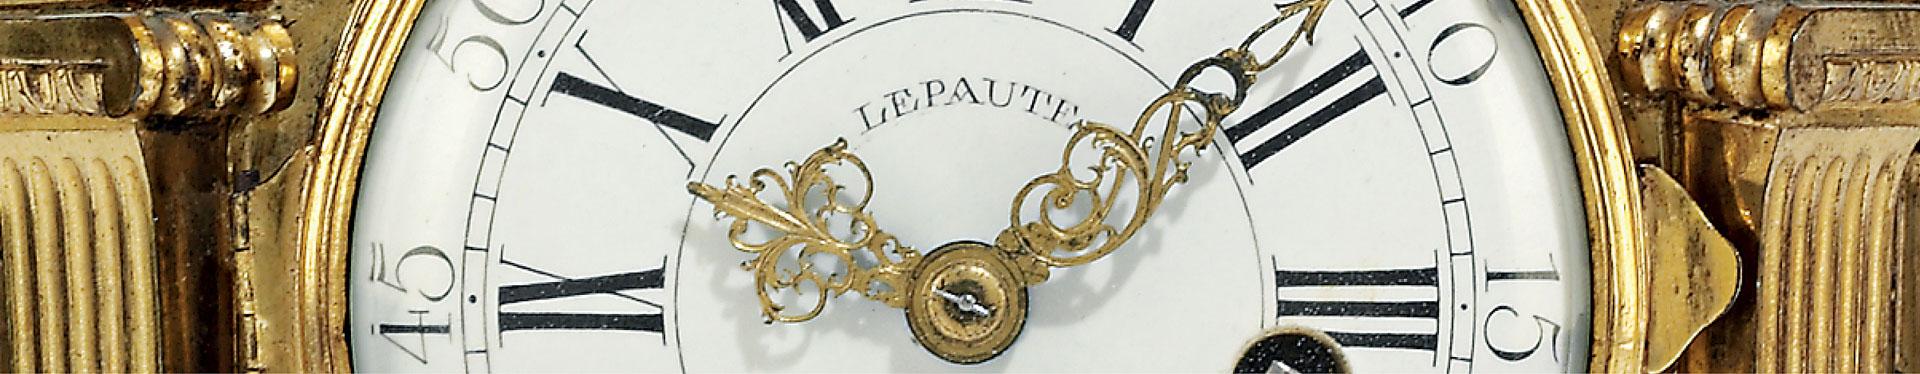 clocks-marine-chronometers-and-barometers-banner-FINAL_18_1_20170104095309.jpg